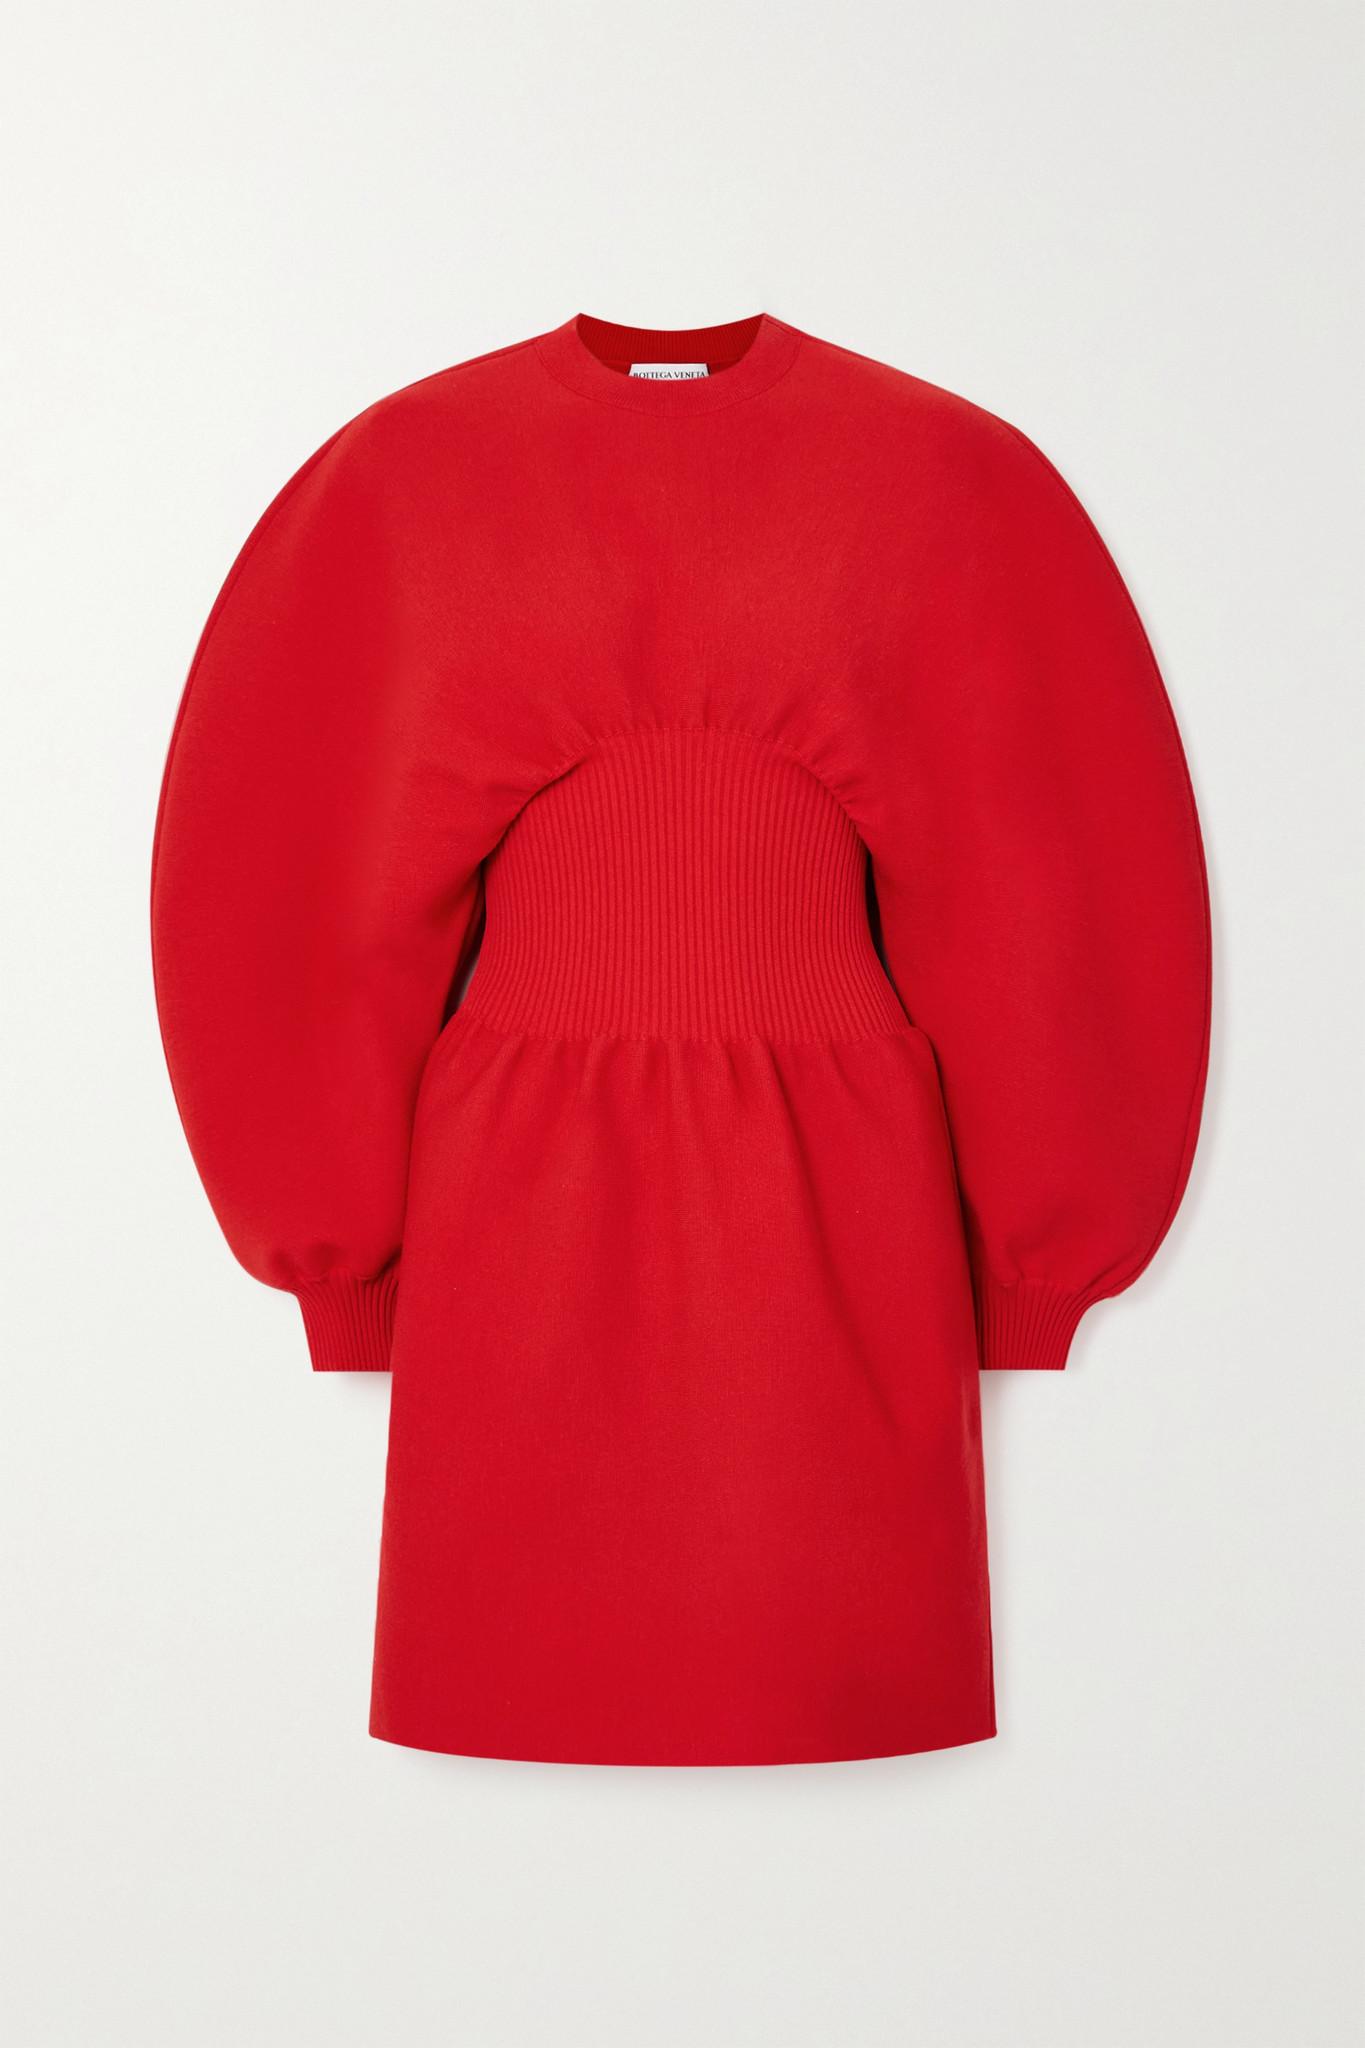 BOTTEGA VENETA - 罗纹羊毛混纺迷你连衣裙 - 红色 - small